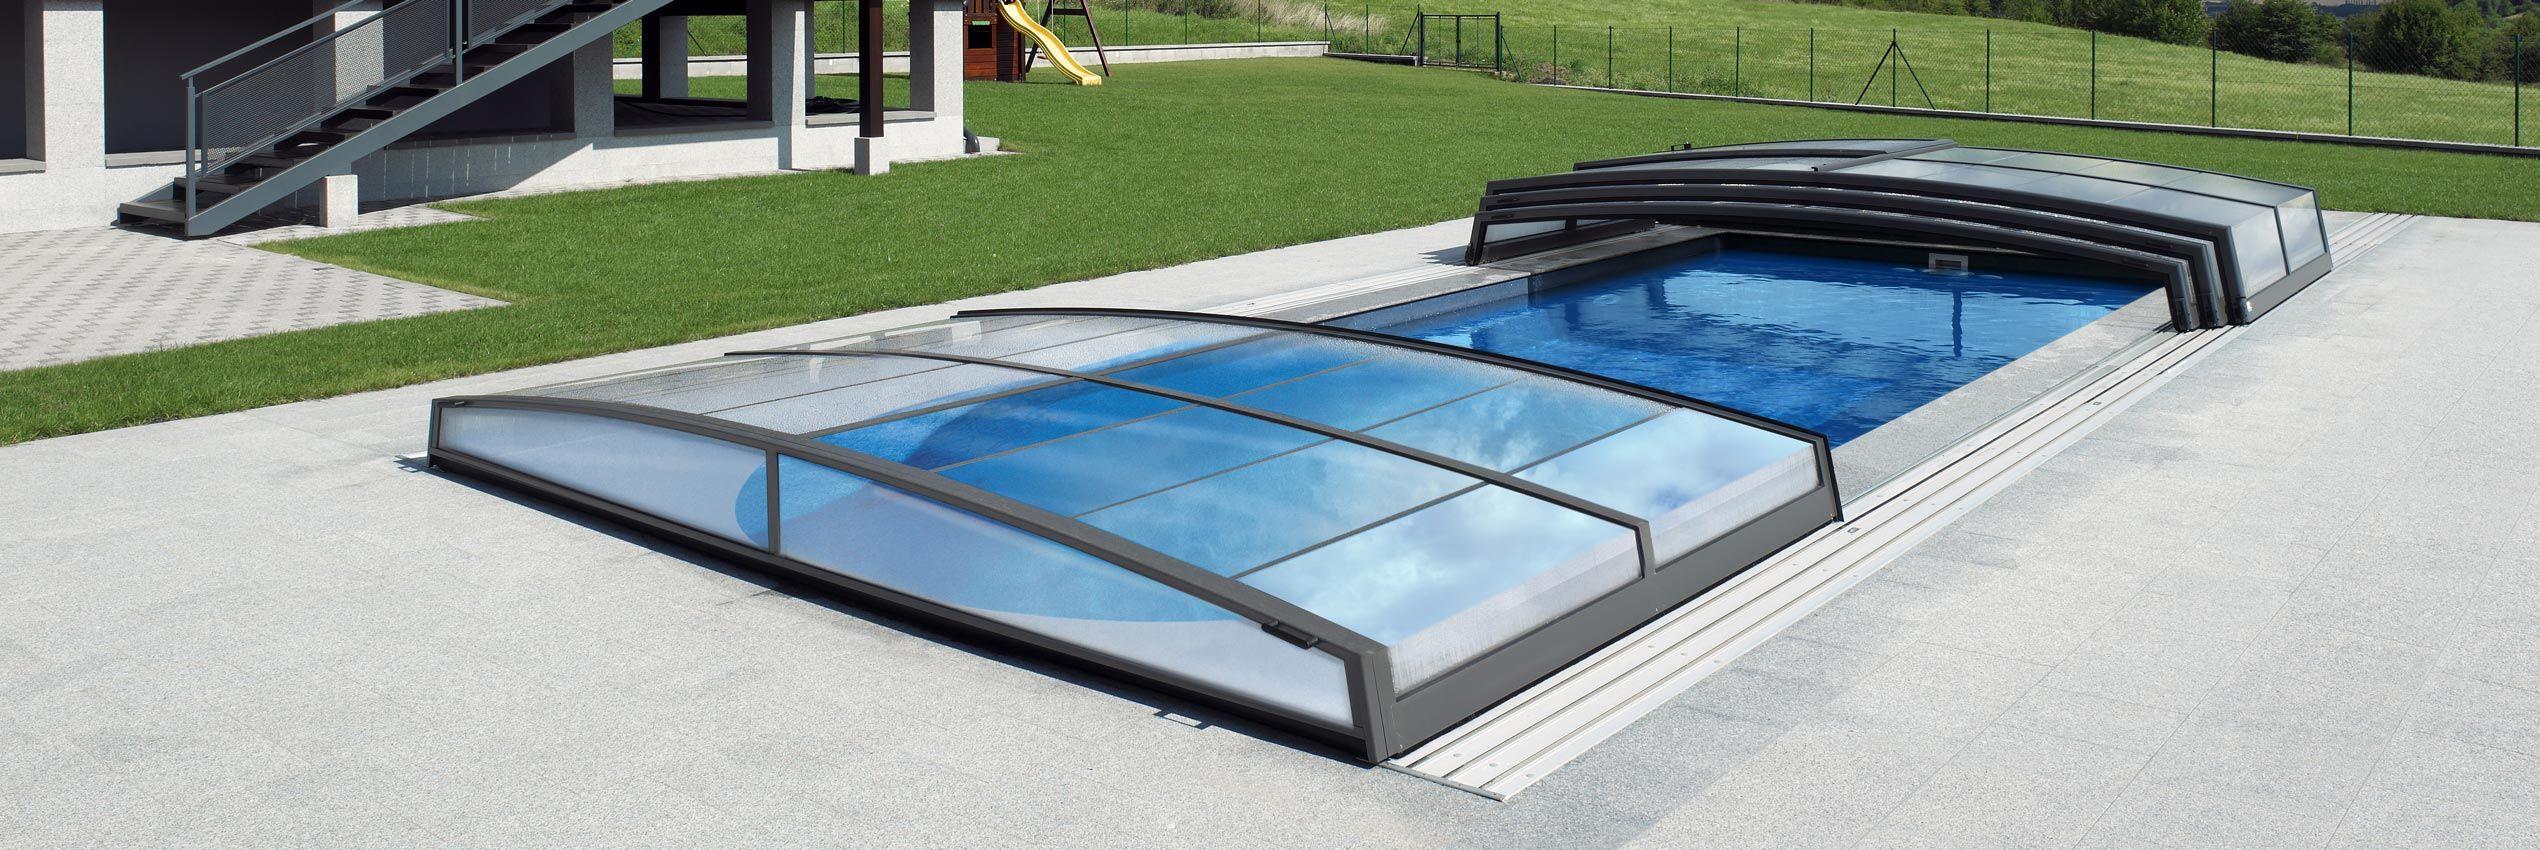 Abri de piscine Corona